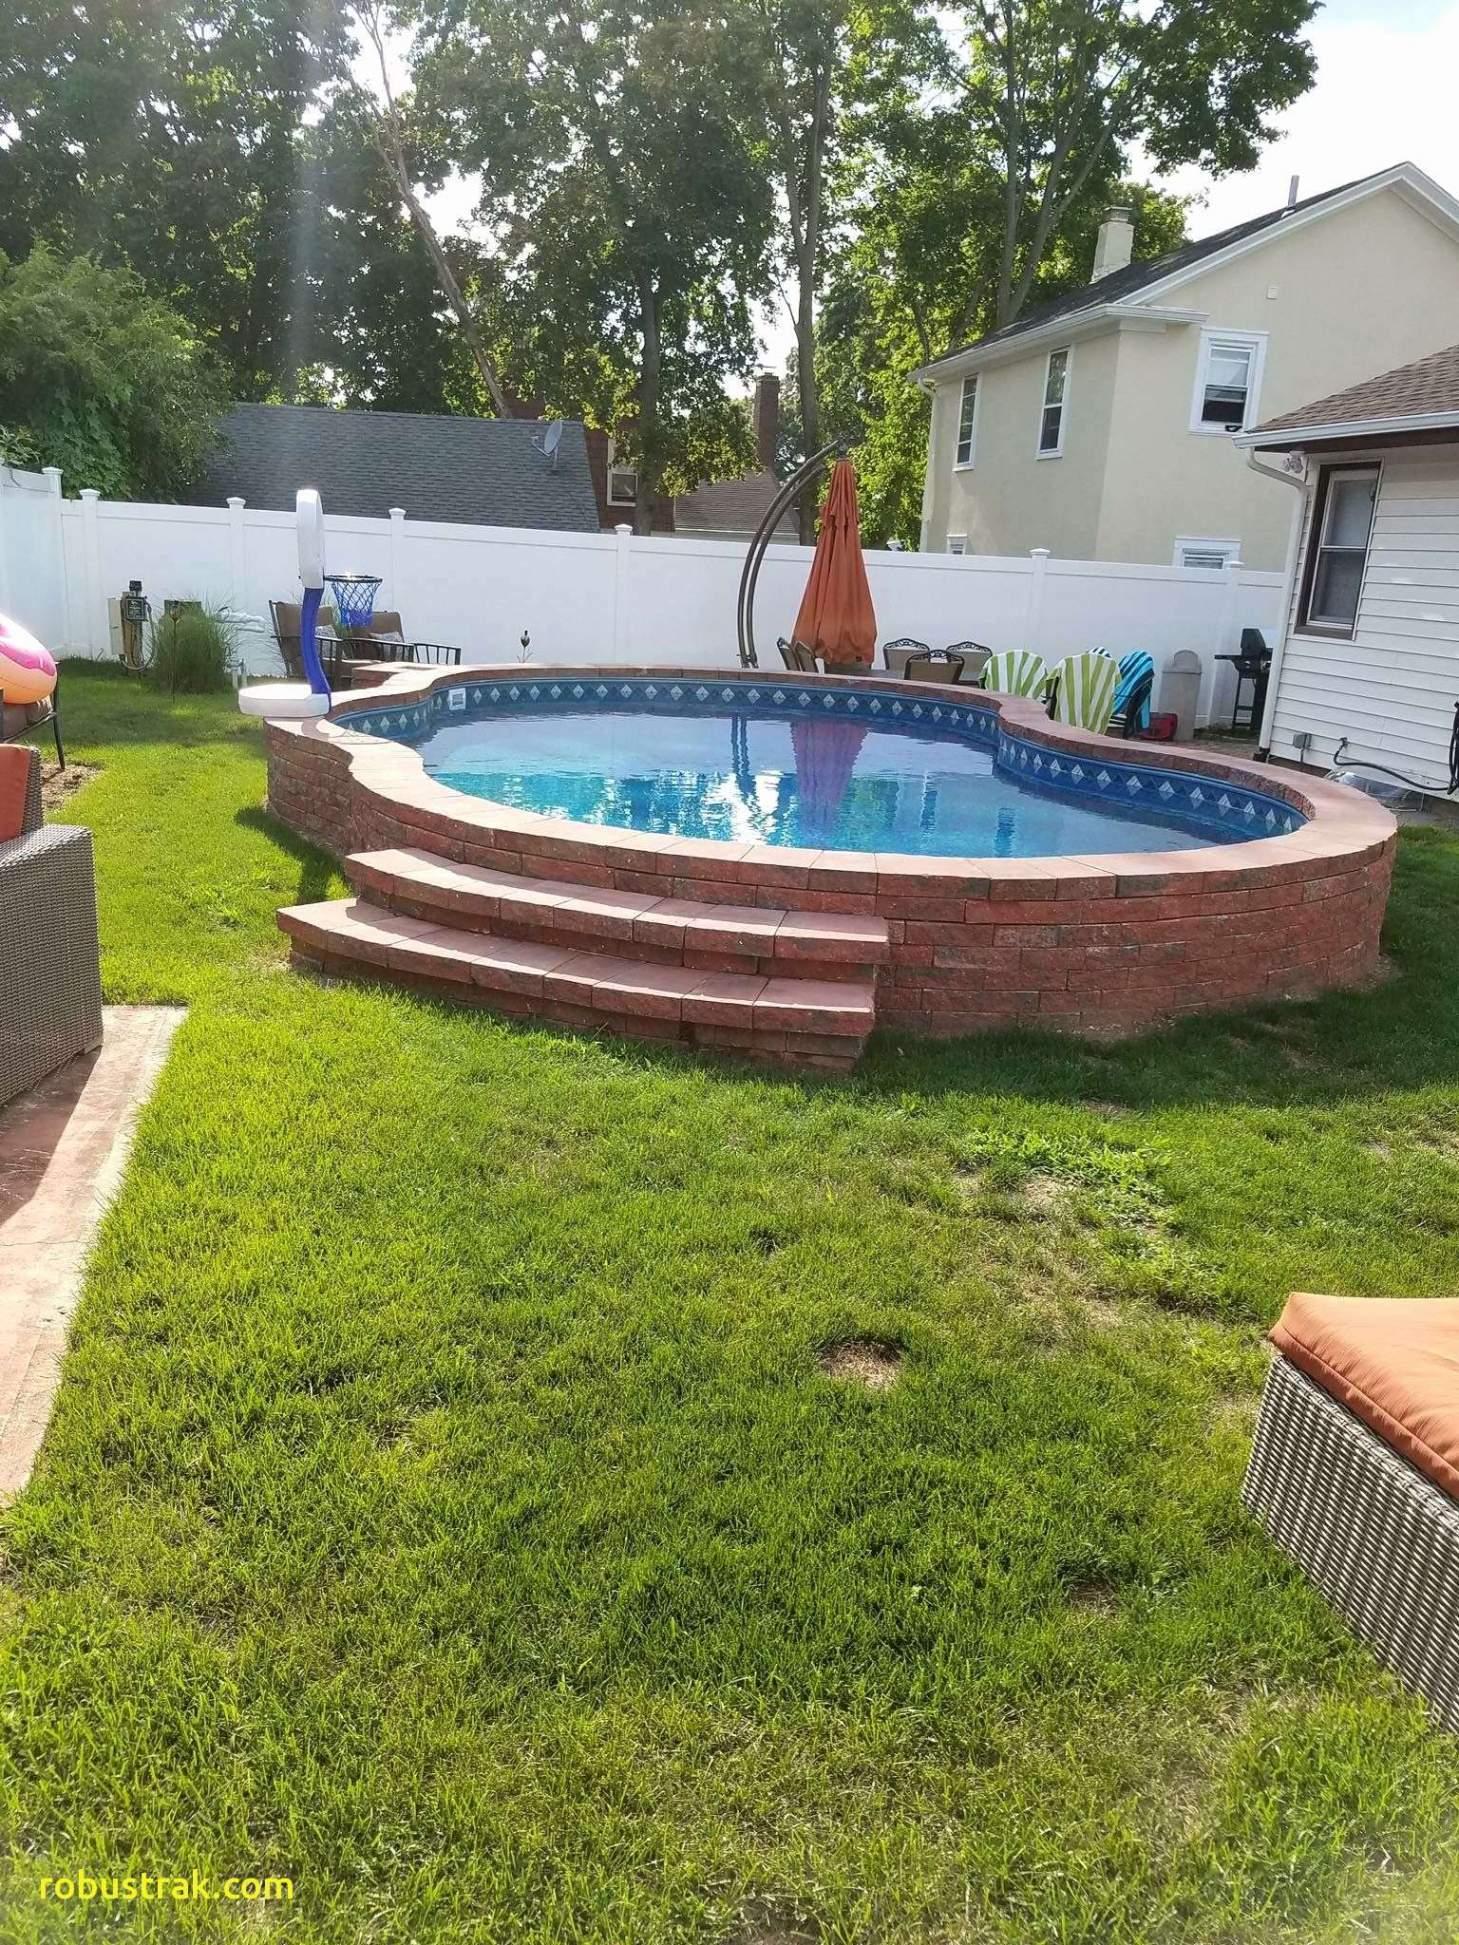 swimming pool garten neu swimmingpool garten kletterturm garten 0d pool kleiner garten pool kleiner garten